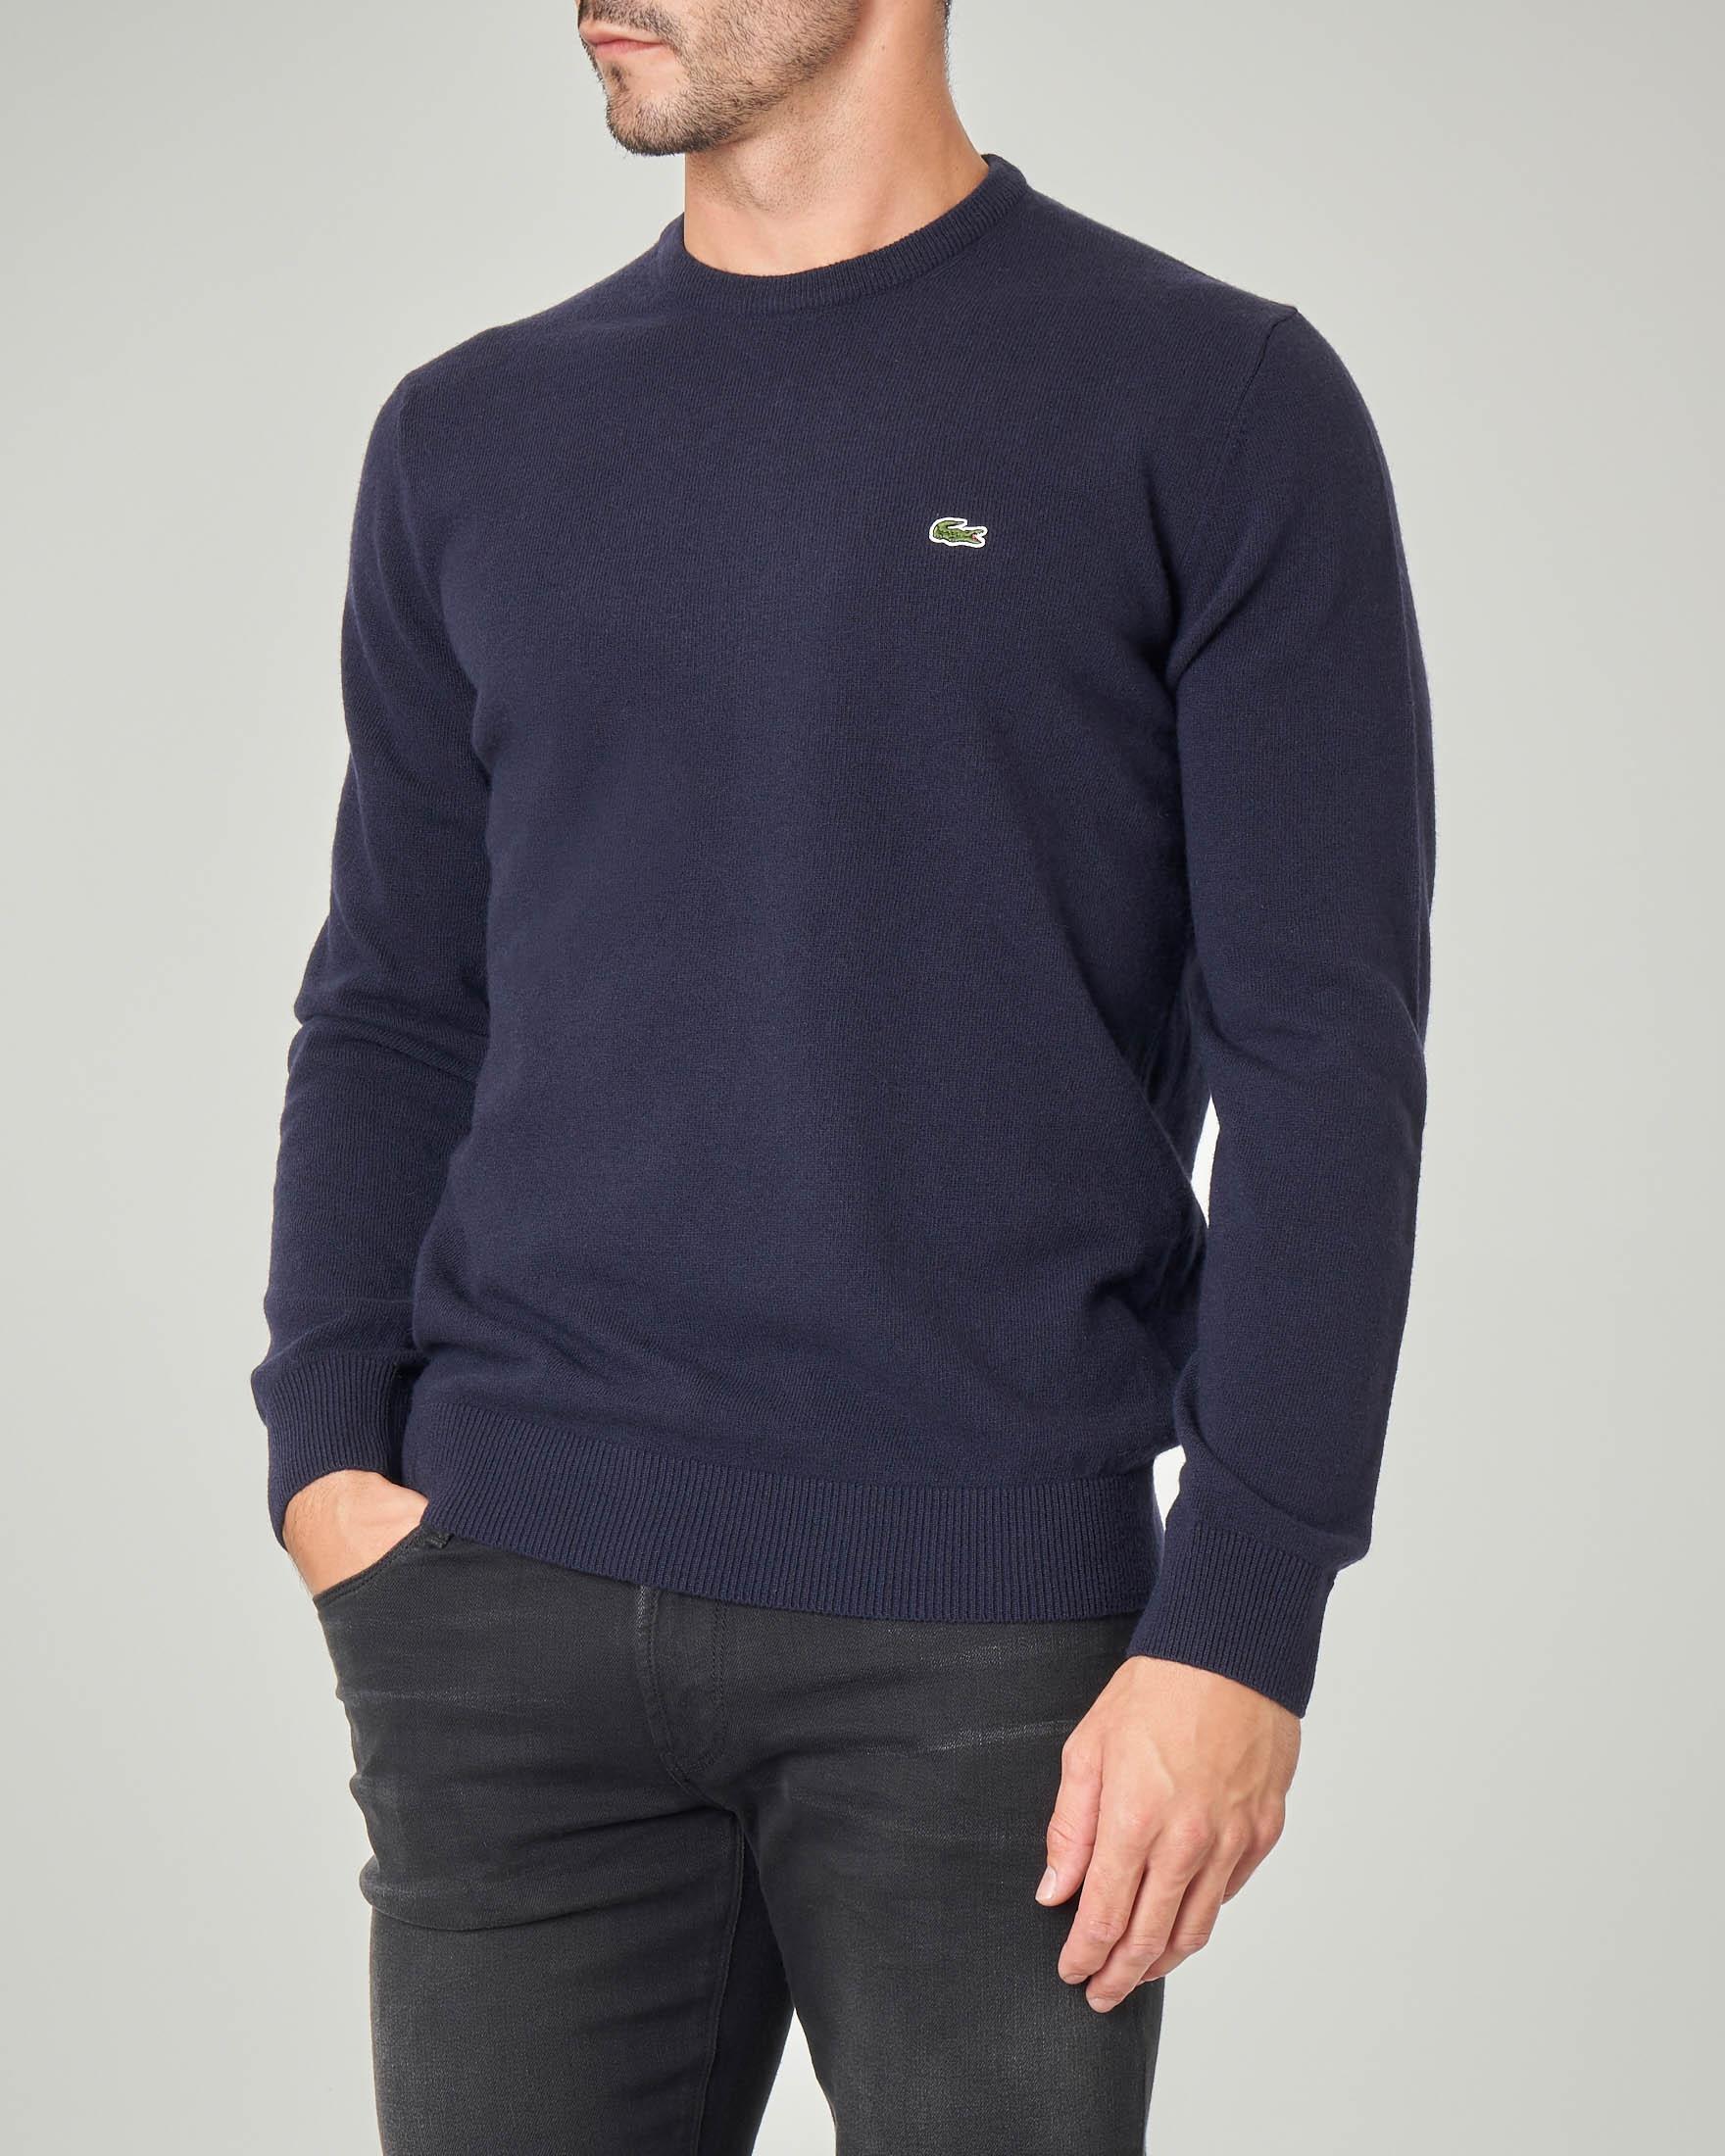 Maglia blu girocollo in pura lana